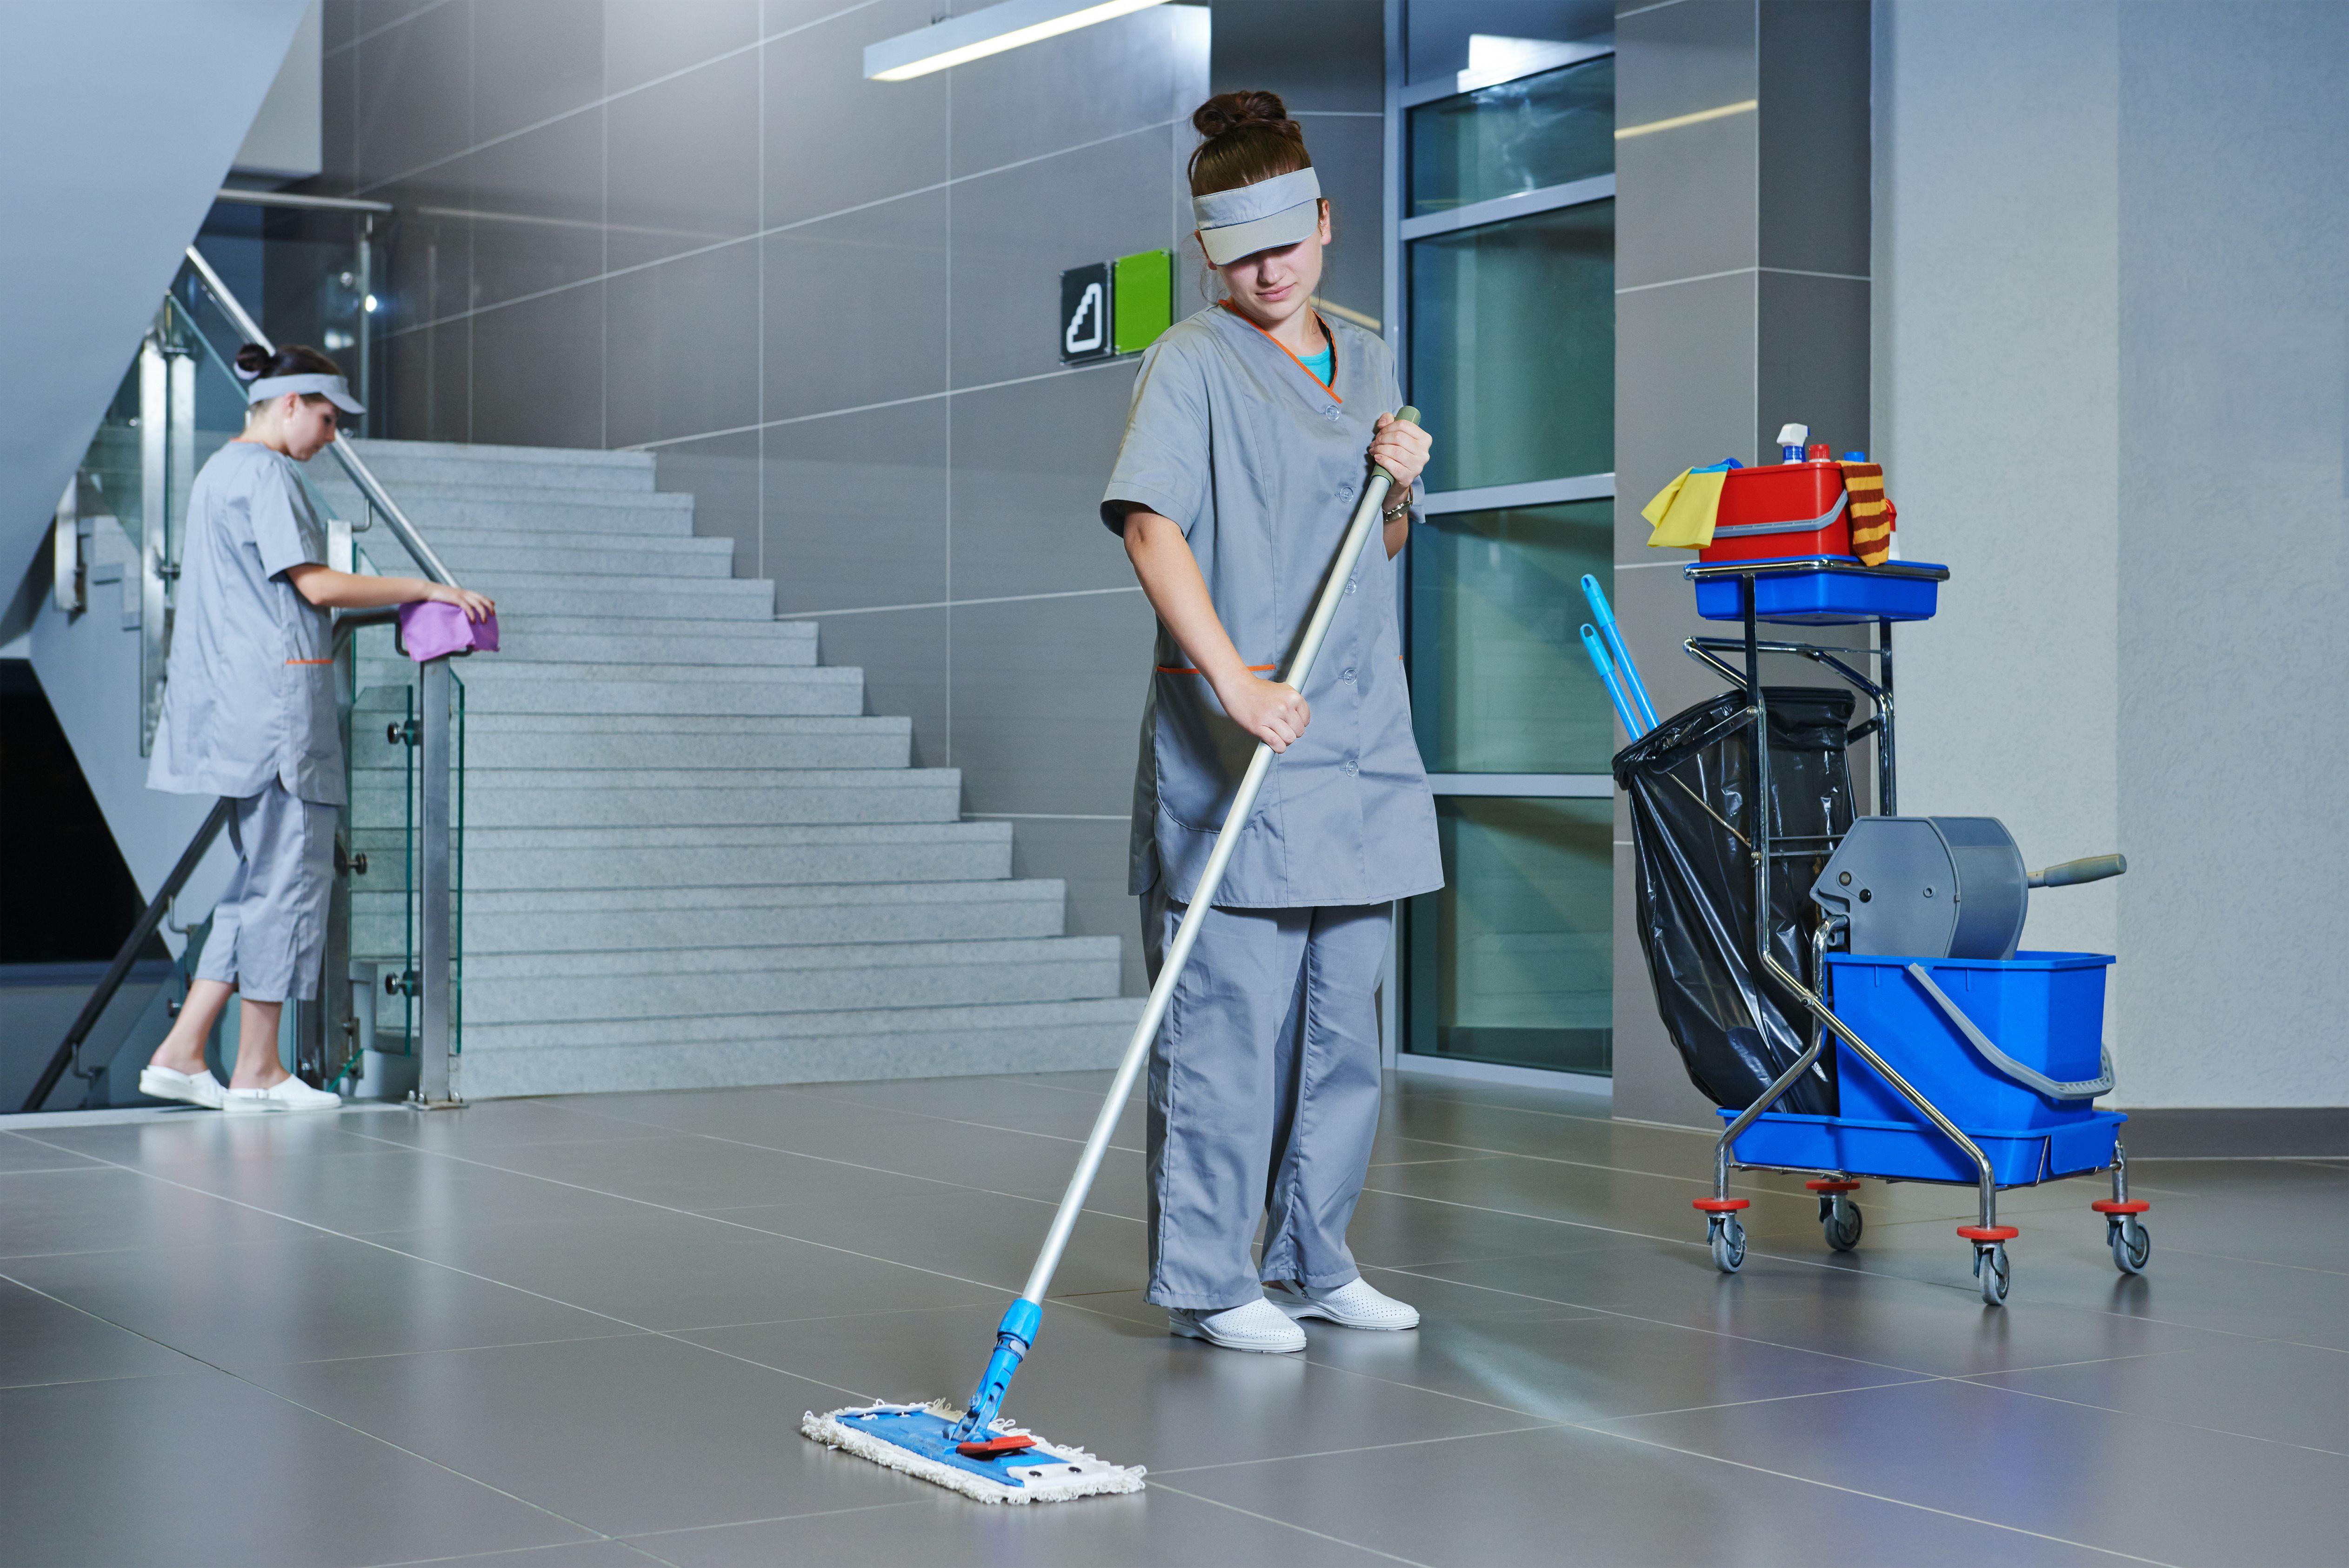 Servicios de limpieza en Palma de Mallorca